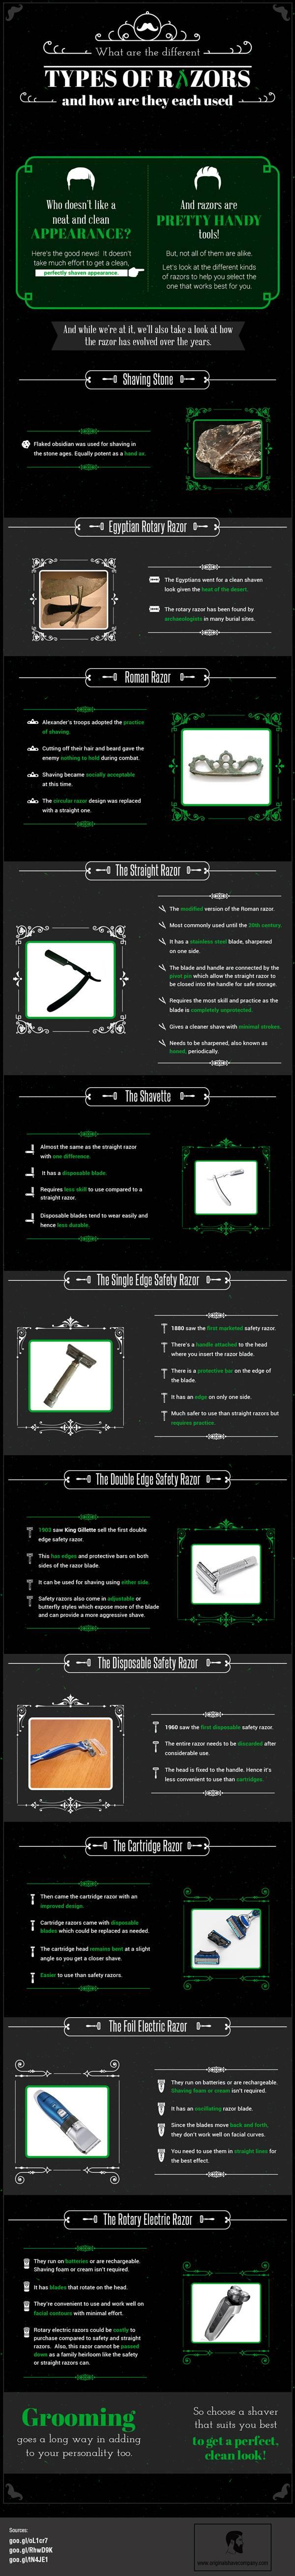 Different-types-of-razors-infographic